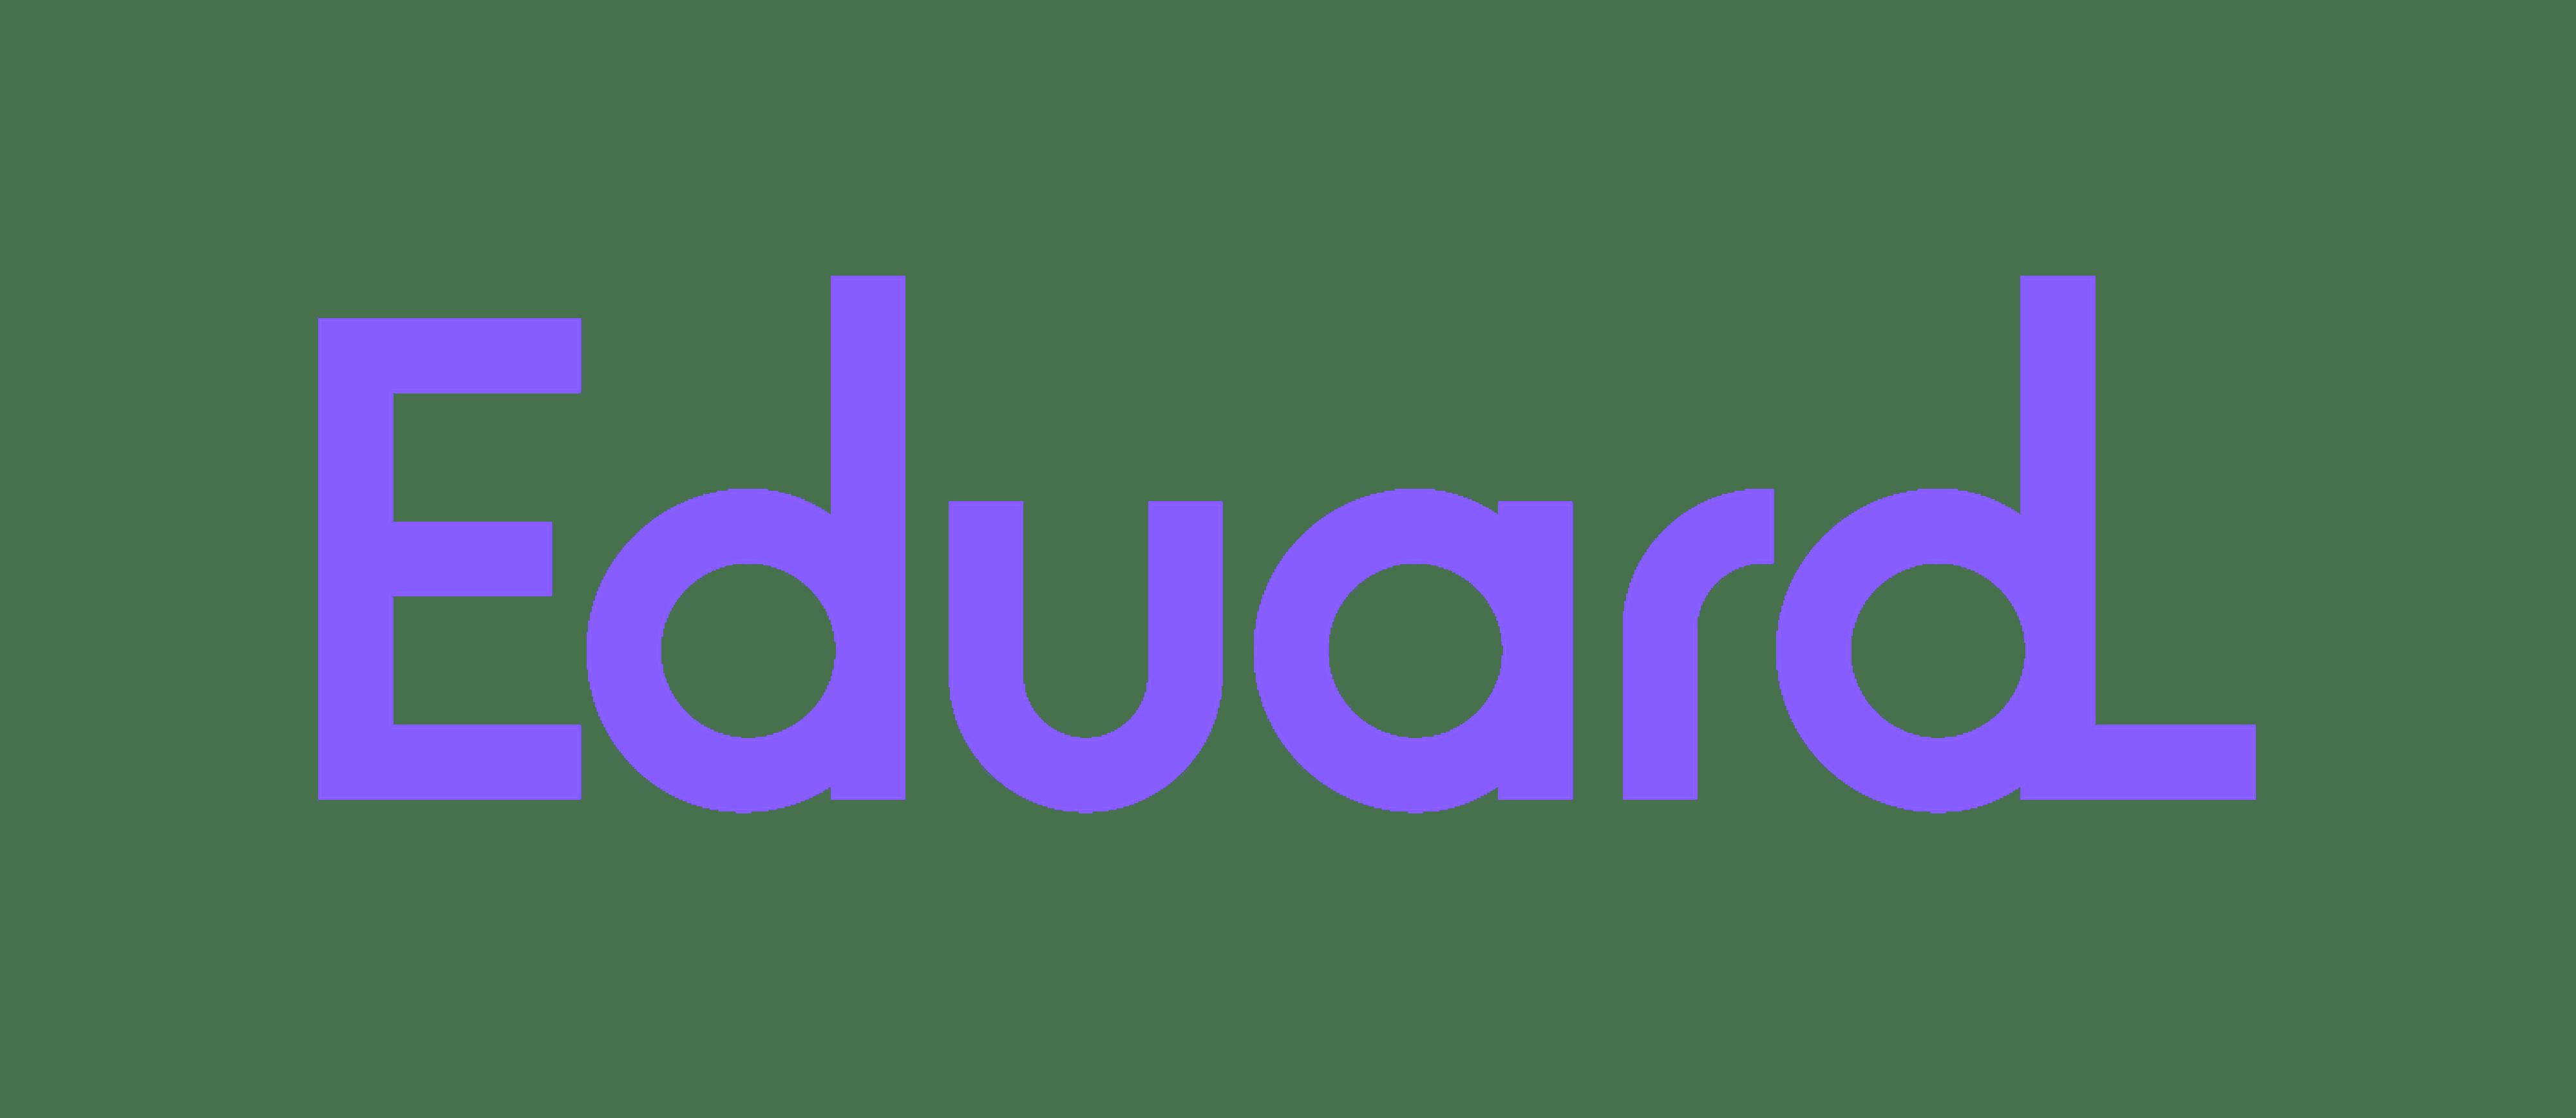 Eduard logo